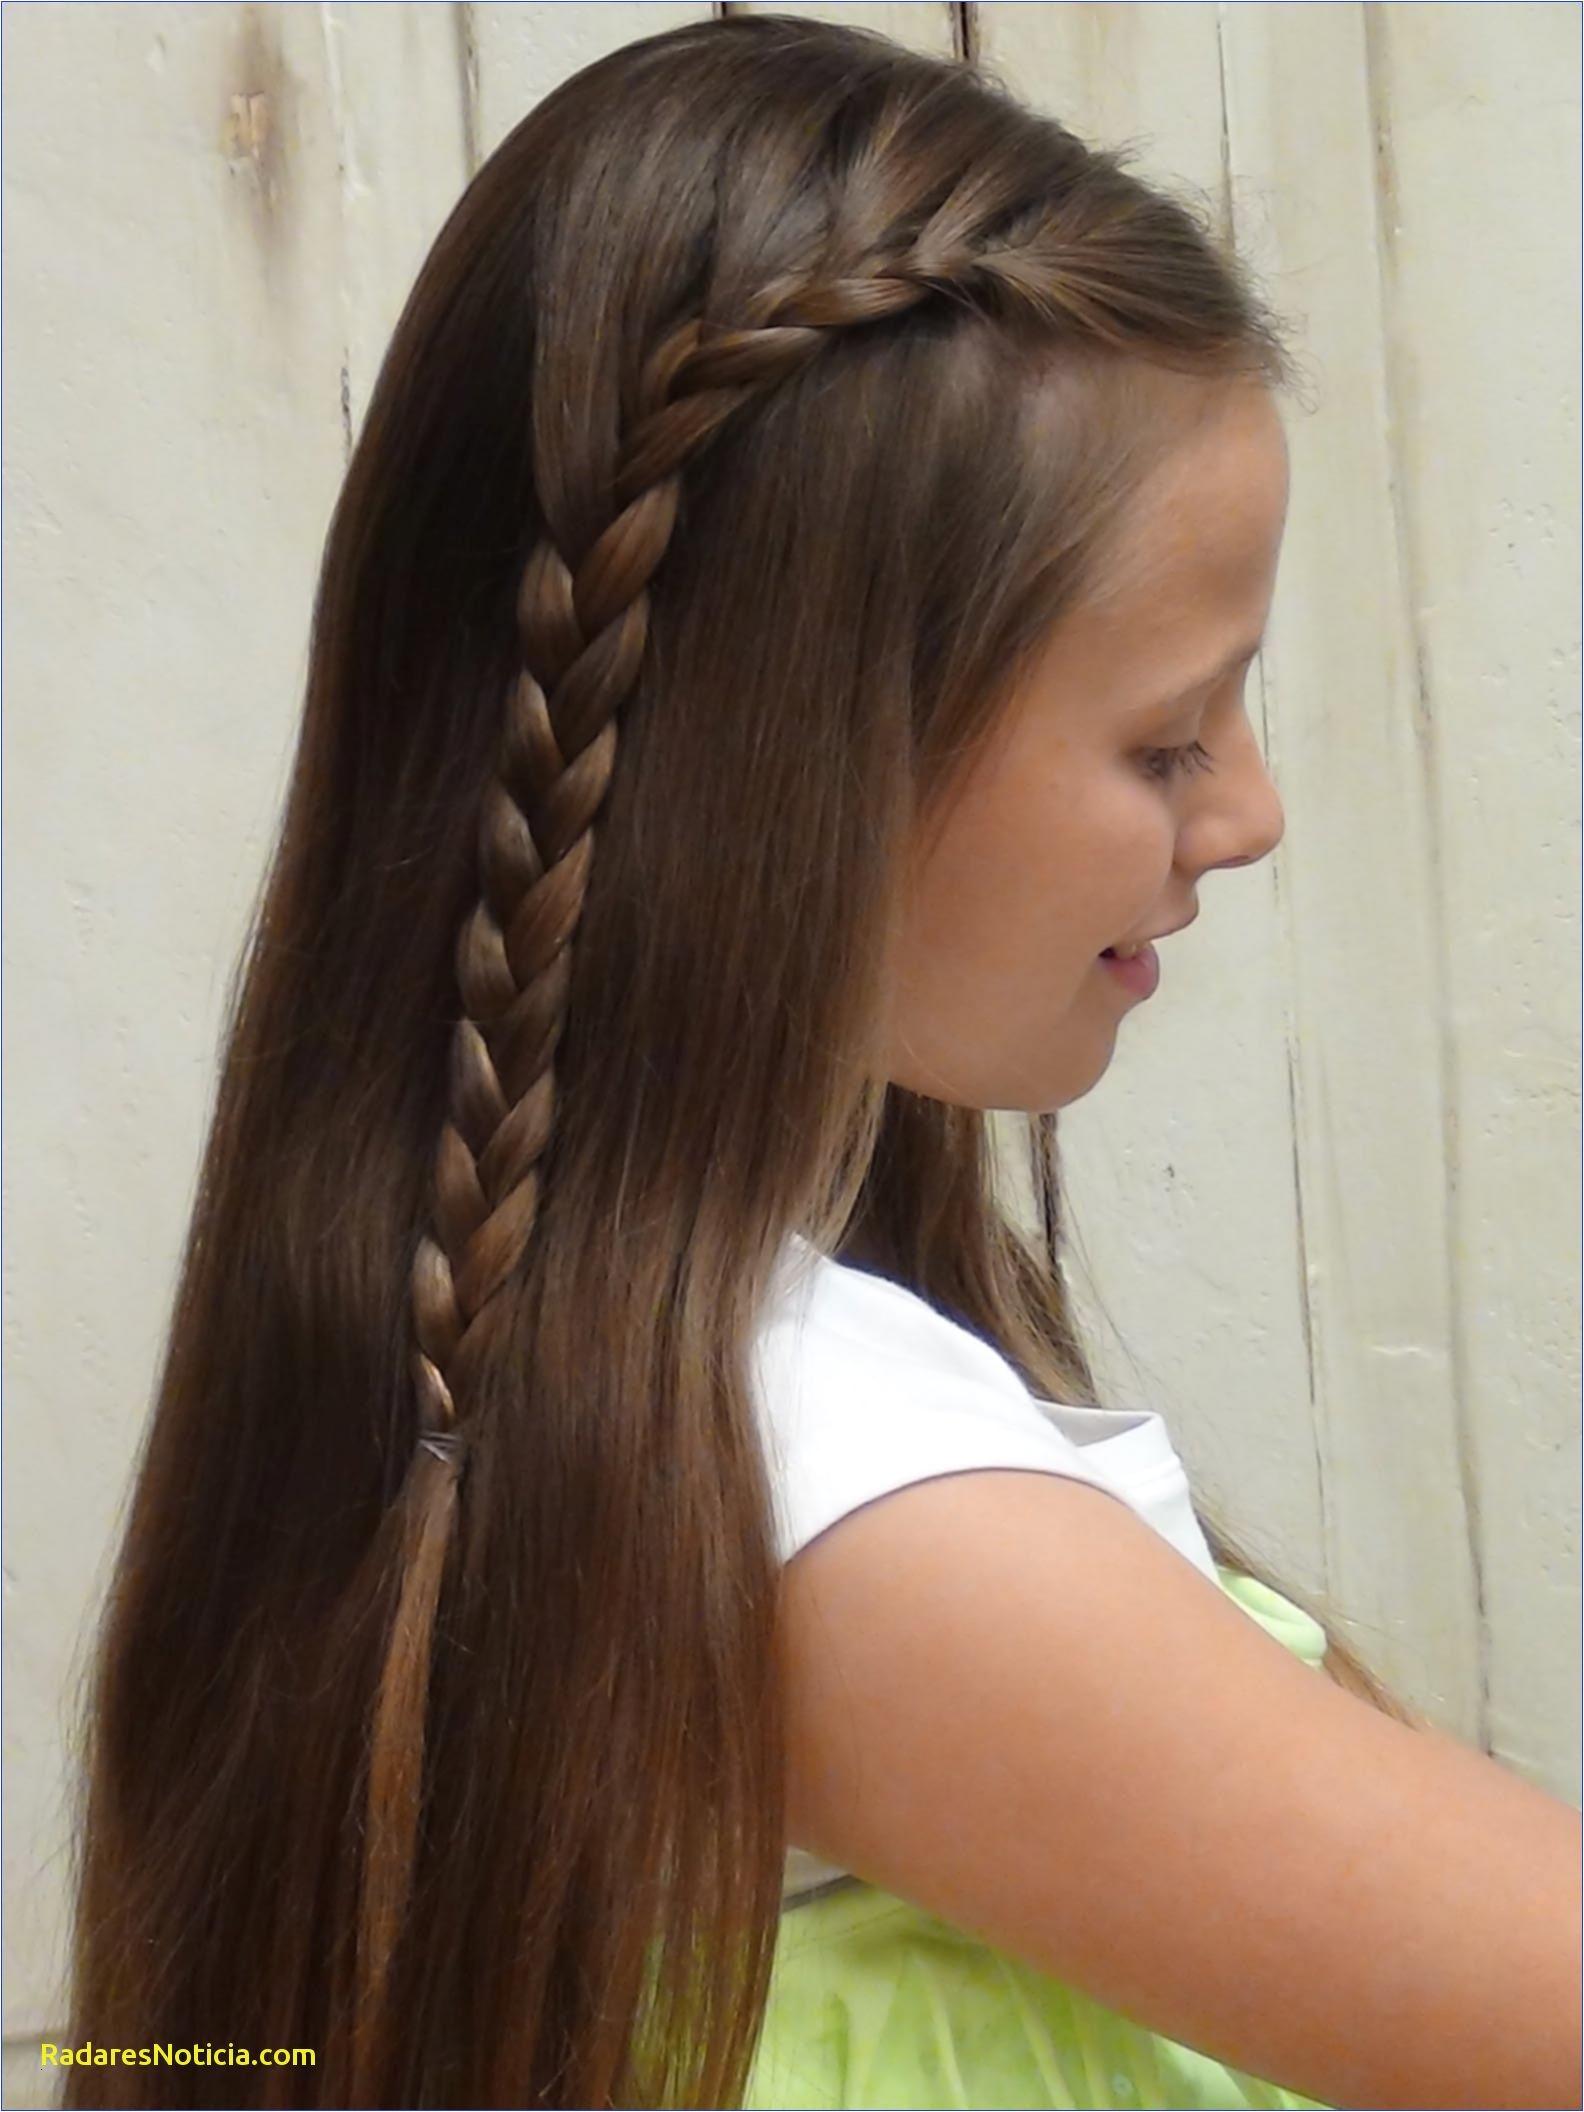 Braided Hairstyles for Short Hair Braid Hairstyles for Short Hair Fresh Fresh Cute and Easy Hairstyles